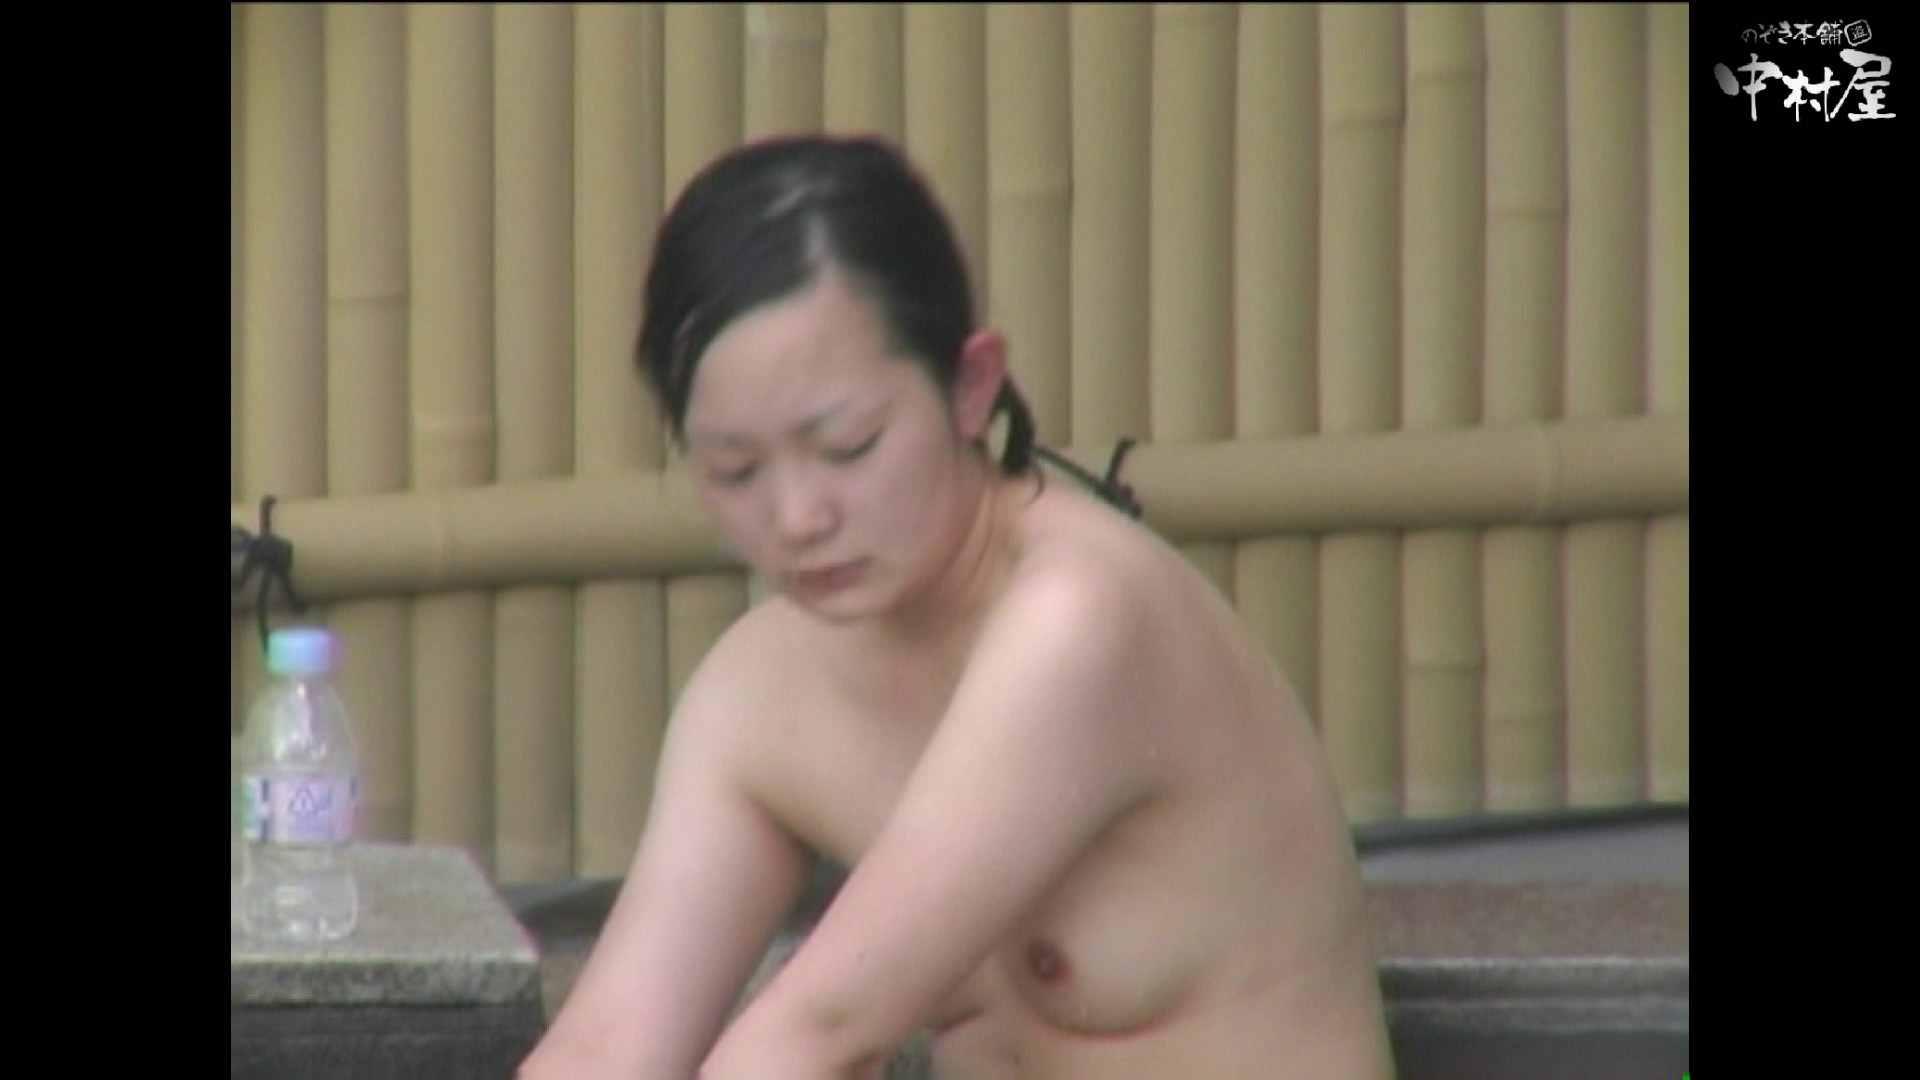 Aquaな露天風呂Vol.892 露天風呂   OLのエロ生活  39連発 31